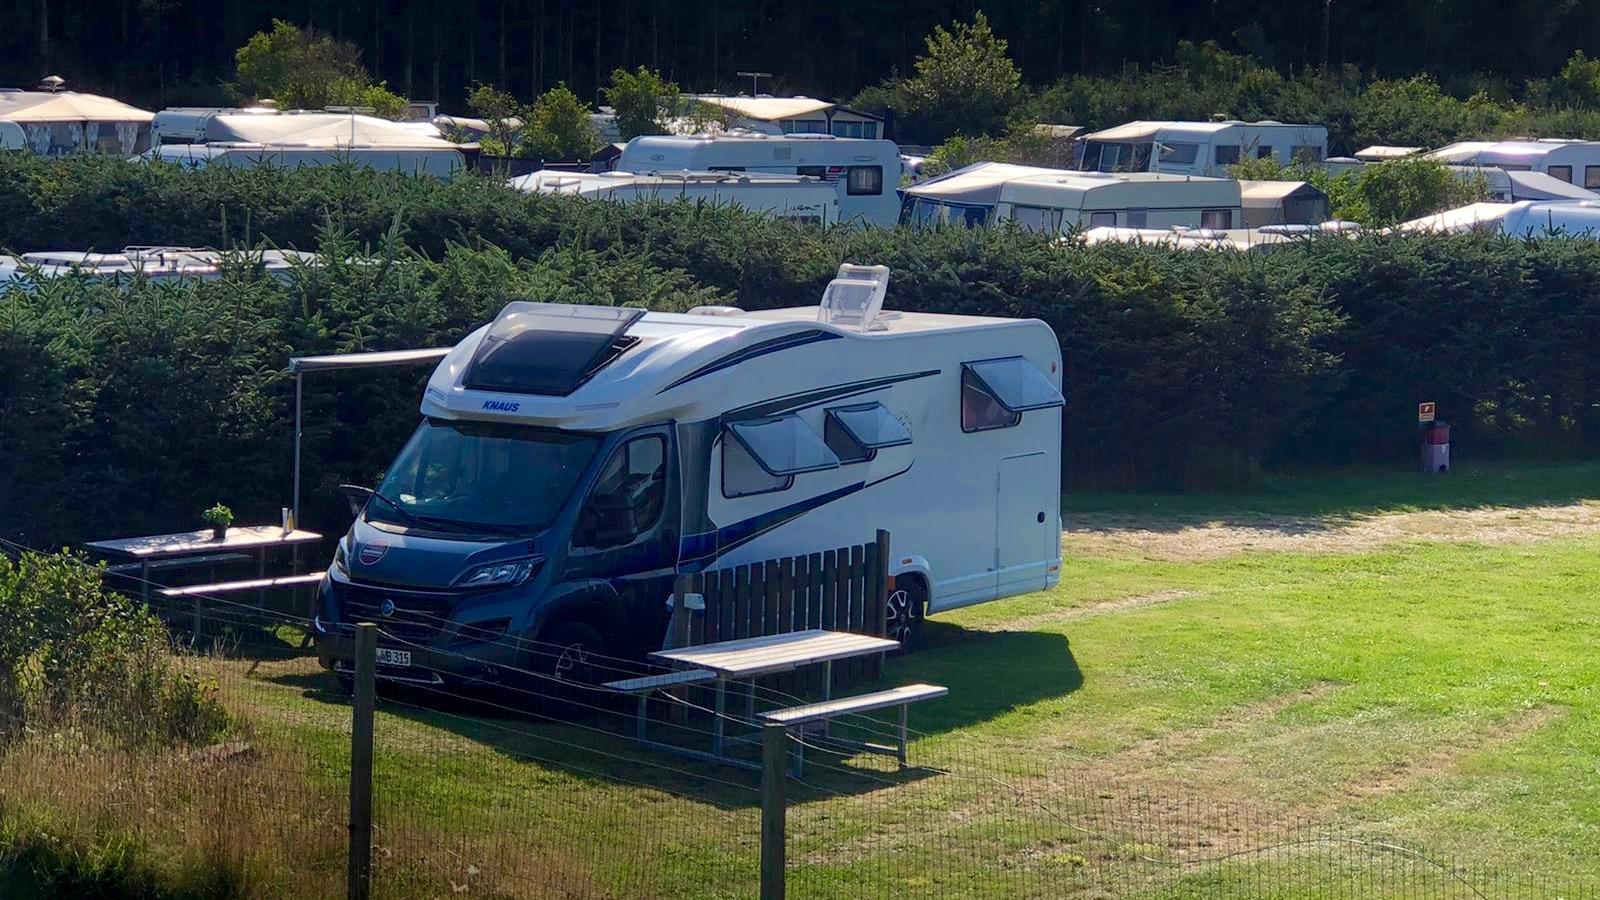 Dänemark-Rundreise im Sommer 2020: Knaus Wohnmobil auf dem Campingplatz Grønhoj Camping